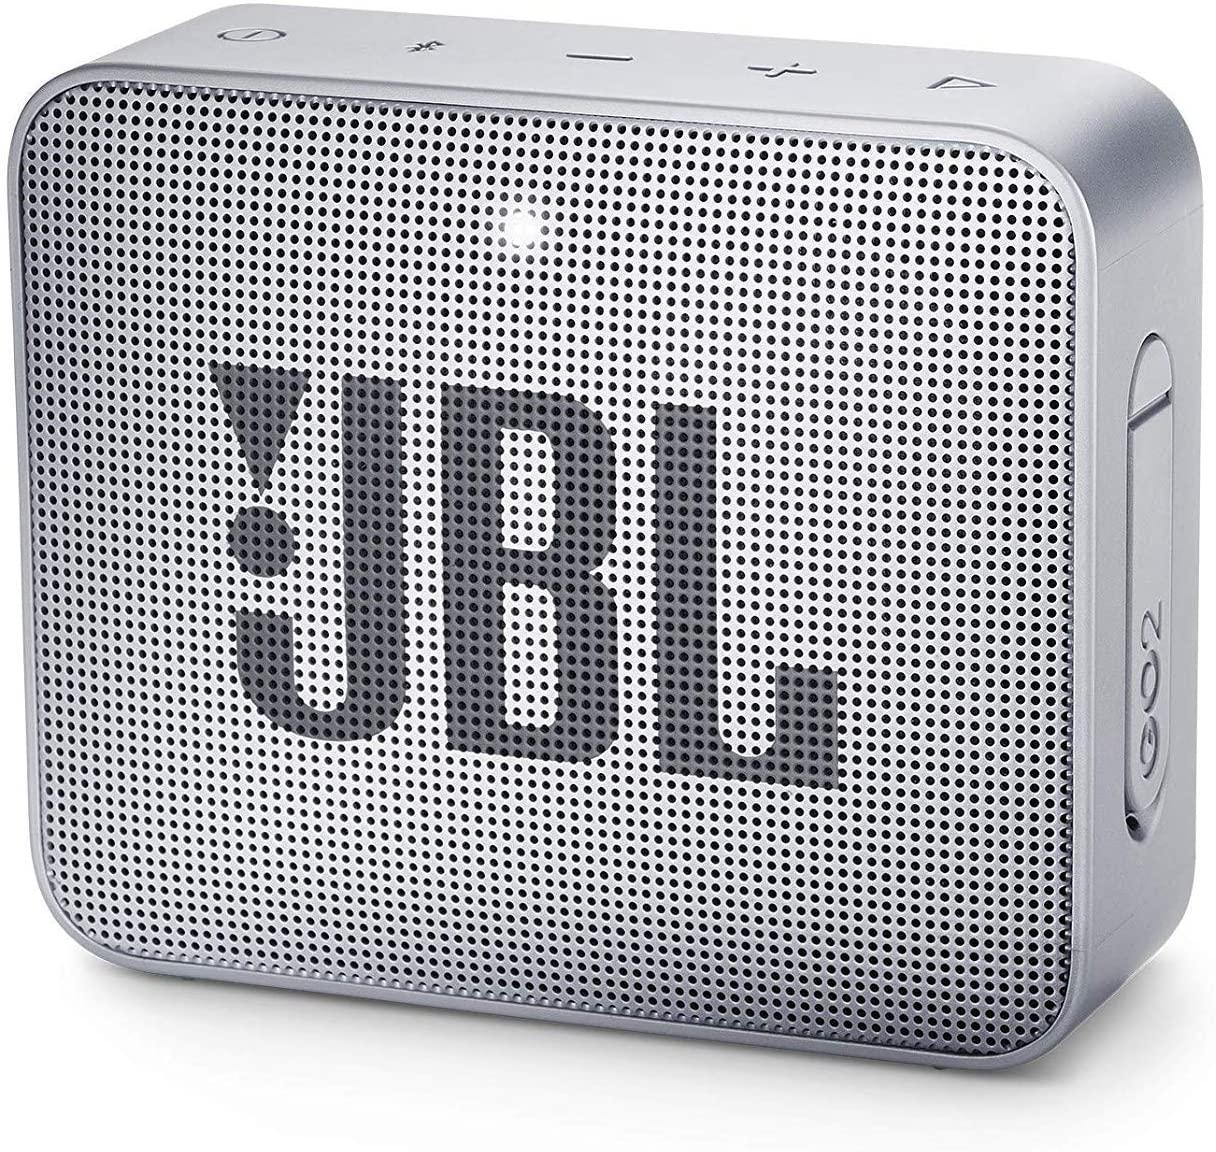 JBL Go 2 amazon